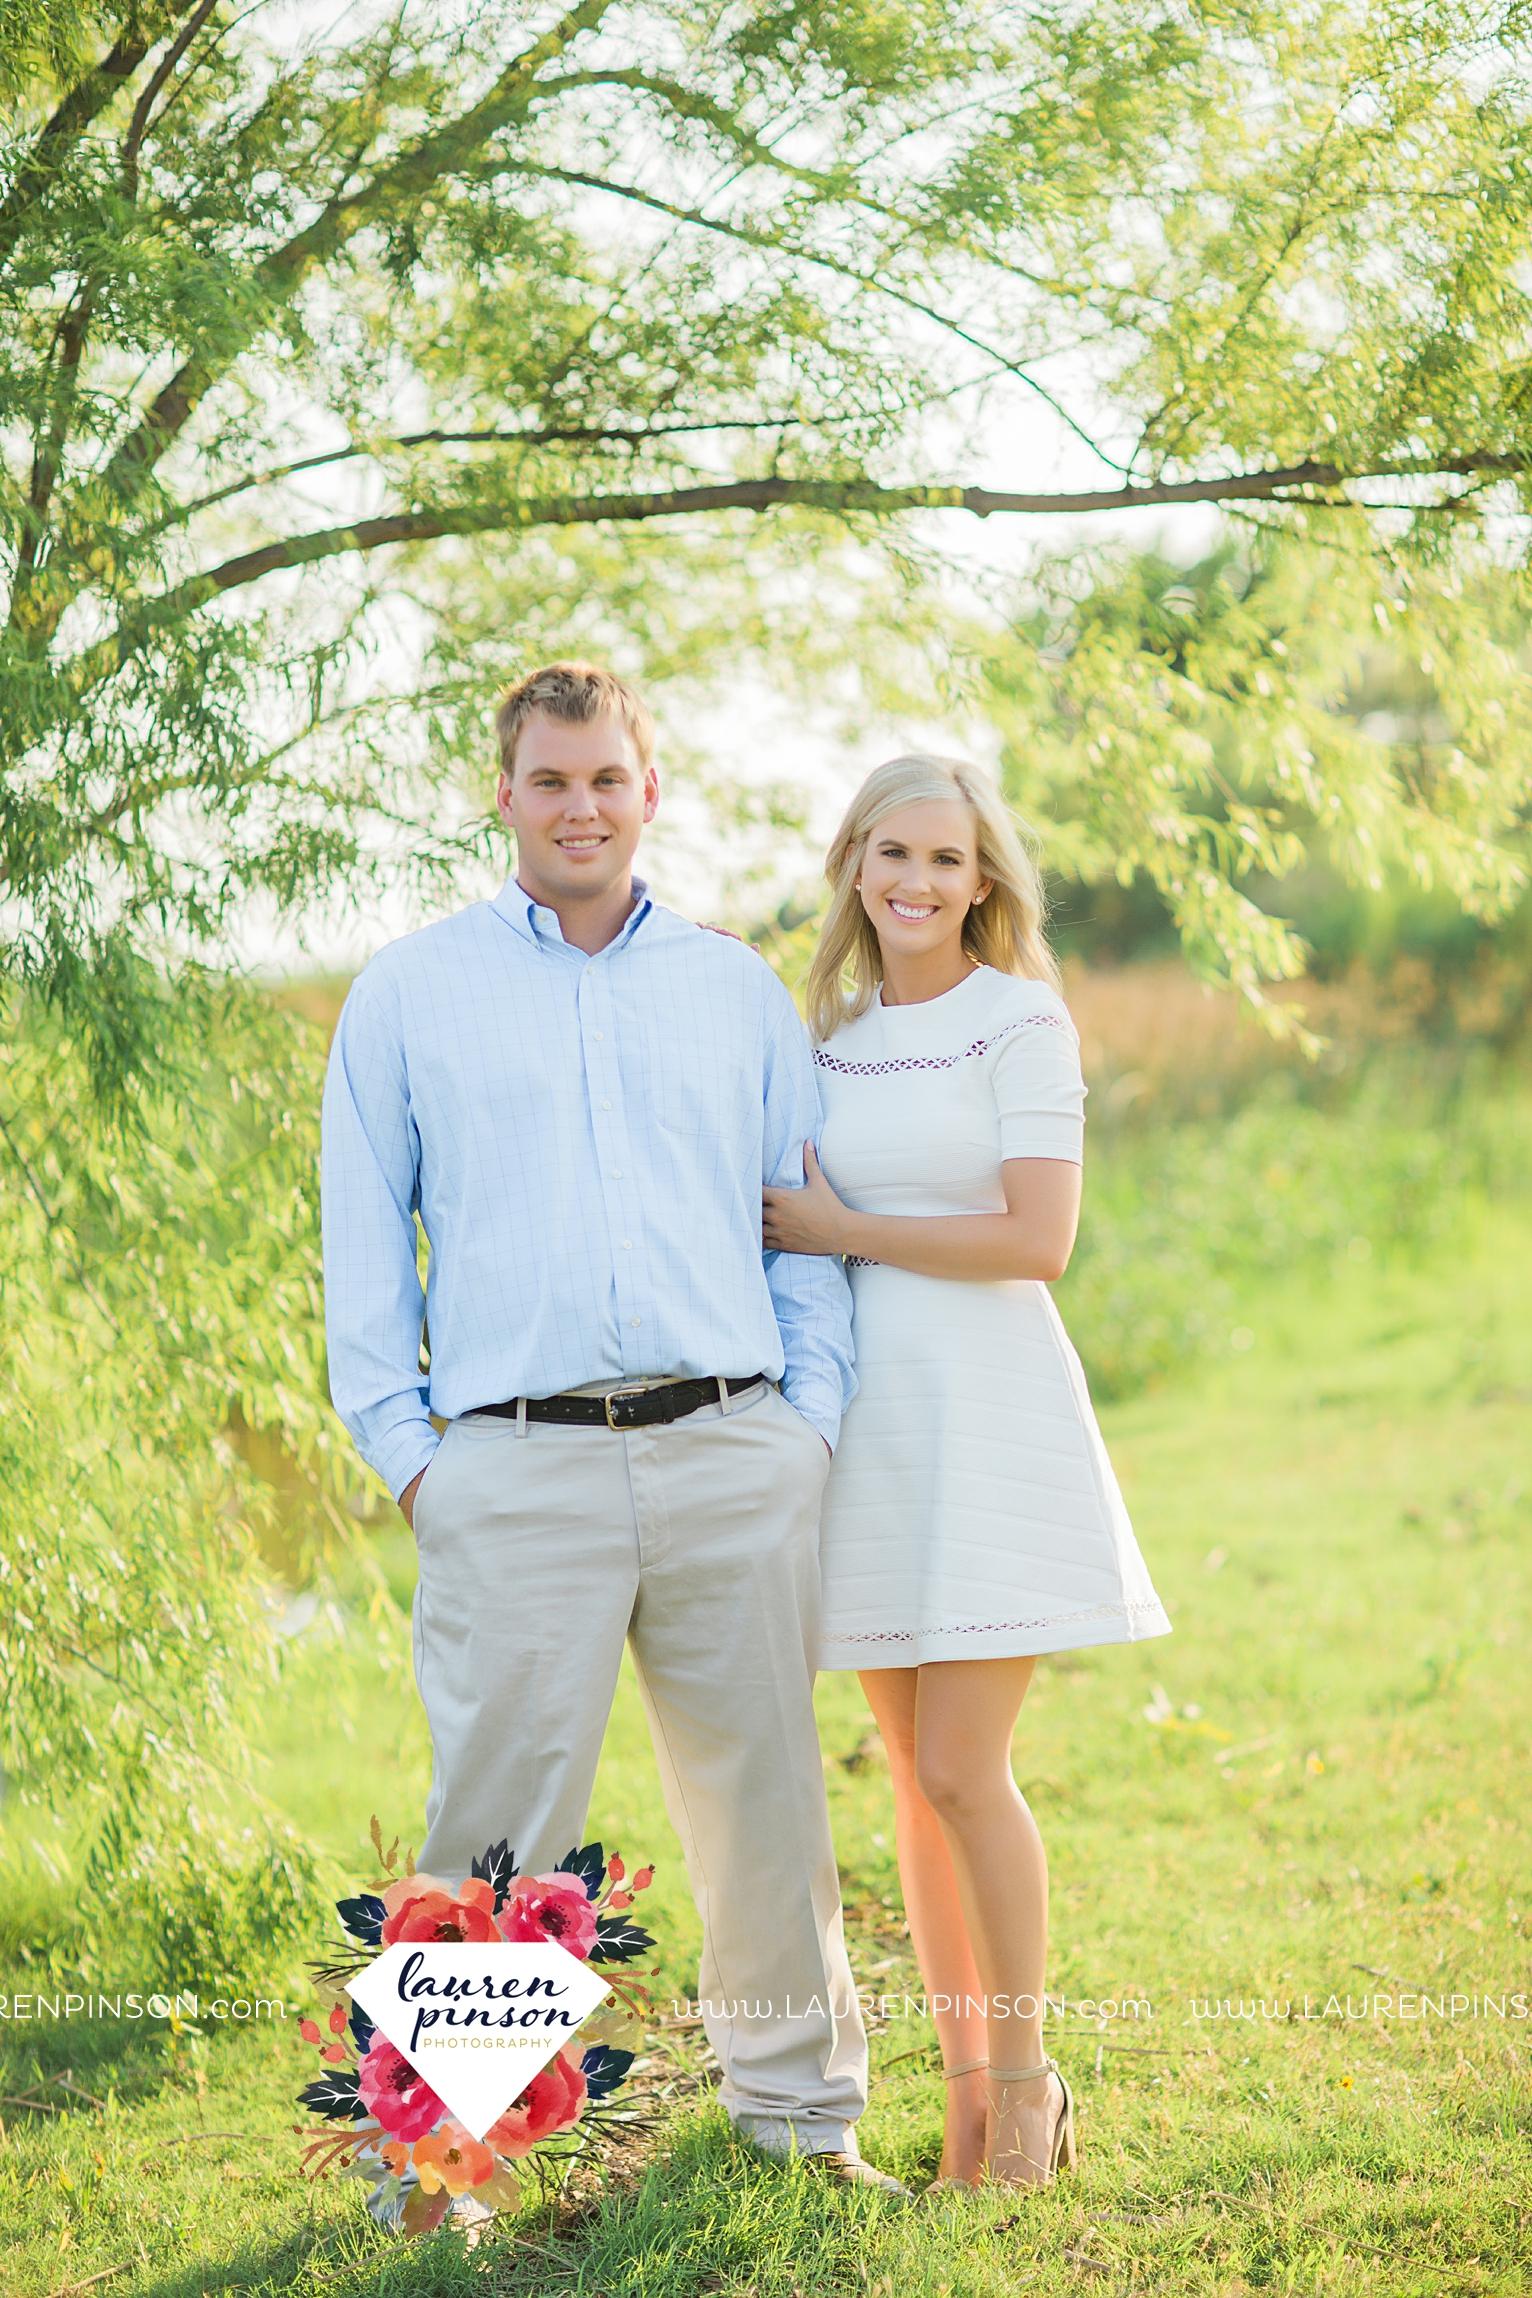 wichita-falls-texas-wedding-photographer-beachy-engagement-session-at-lake-wichita_2907.jpg